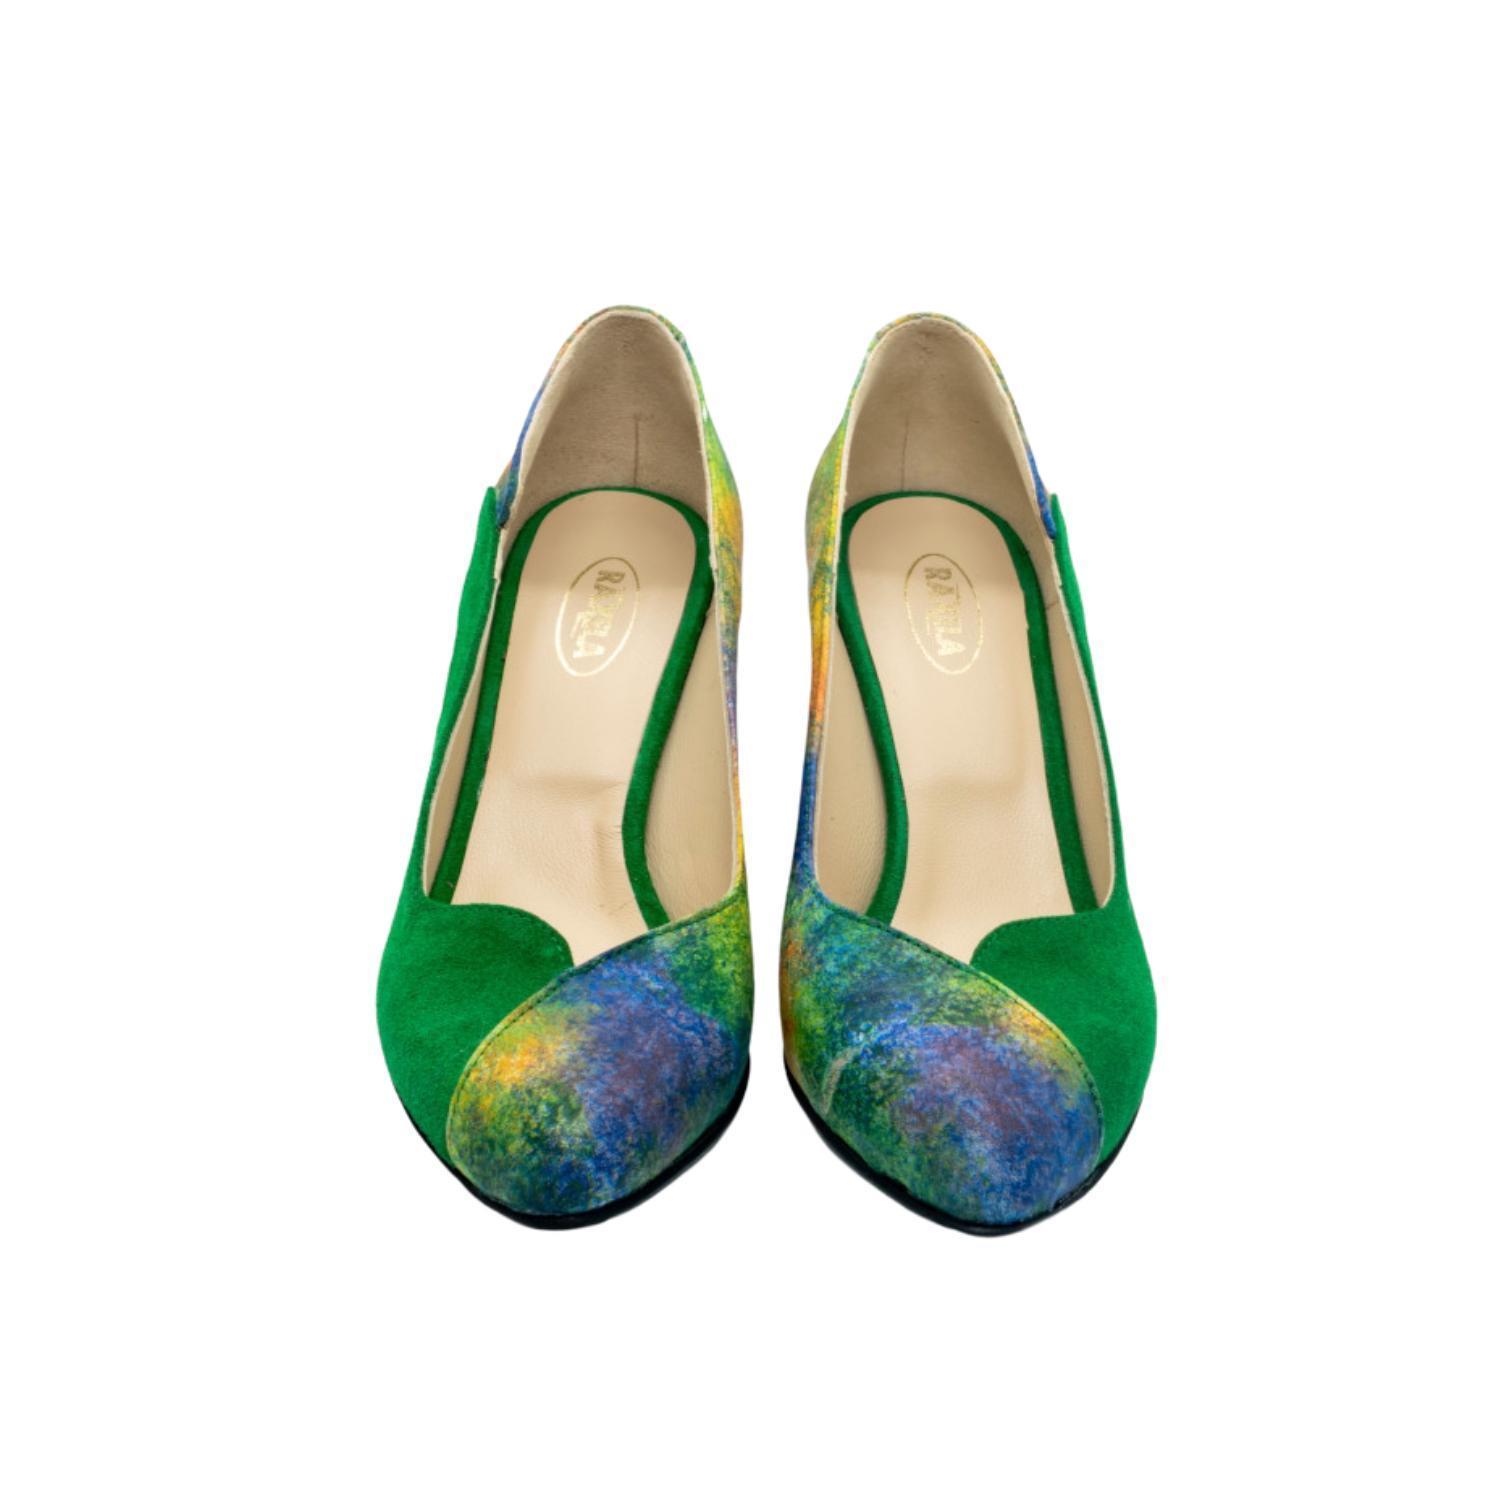 Pantofi verzi curcubeu